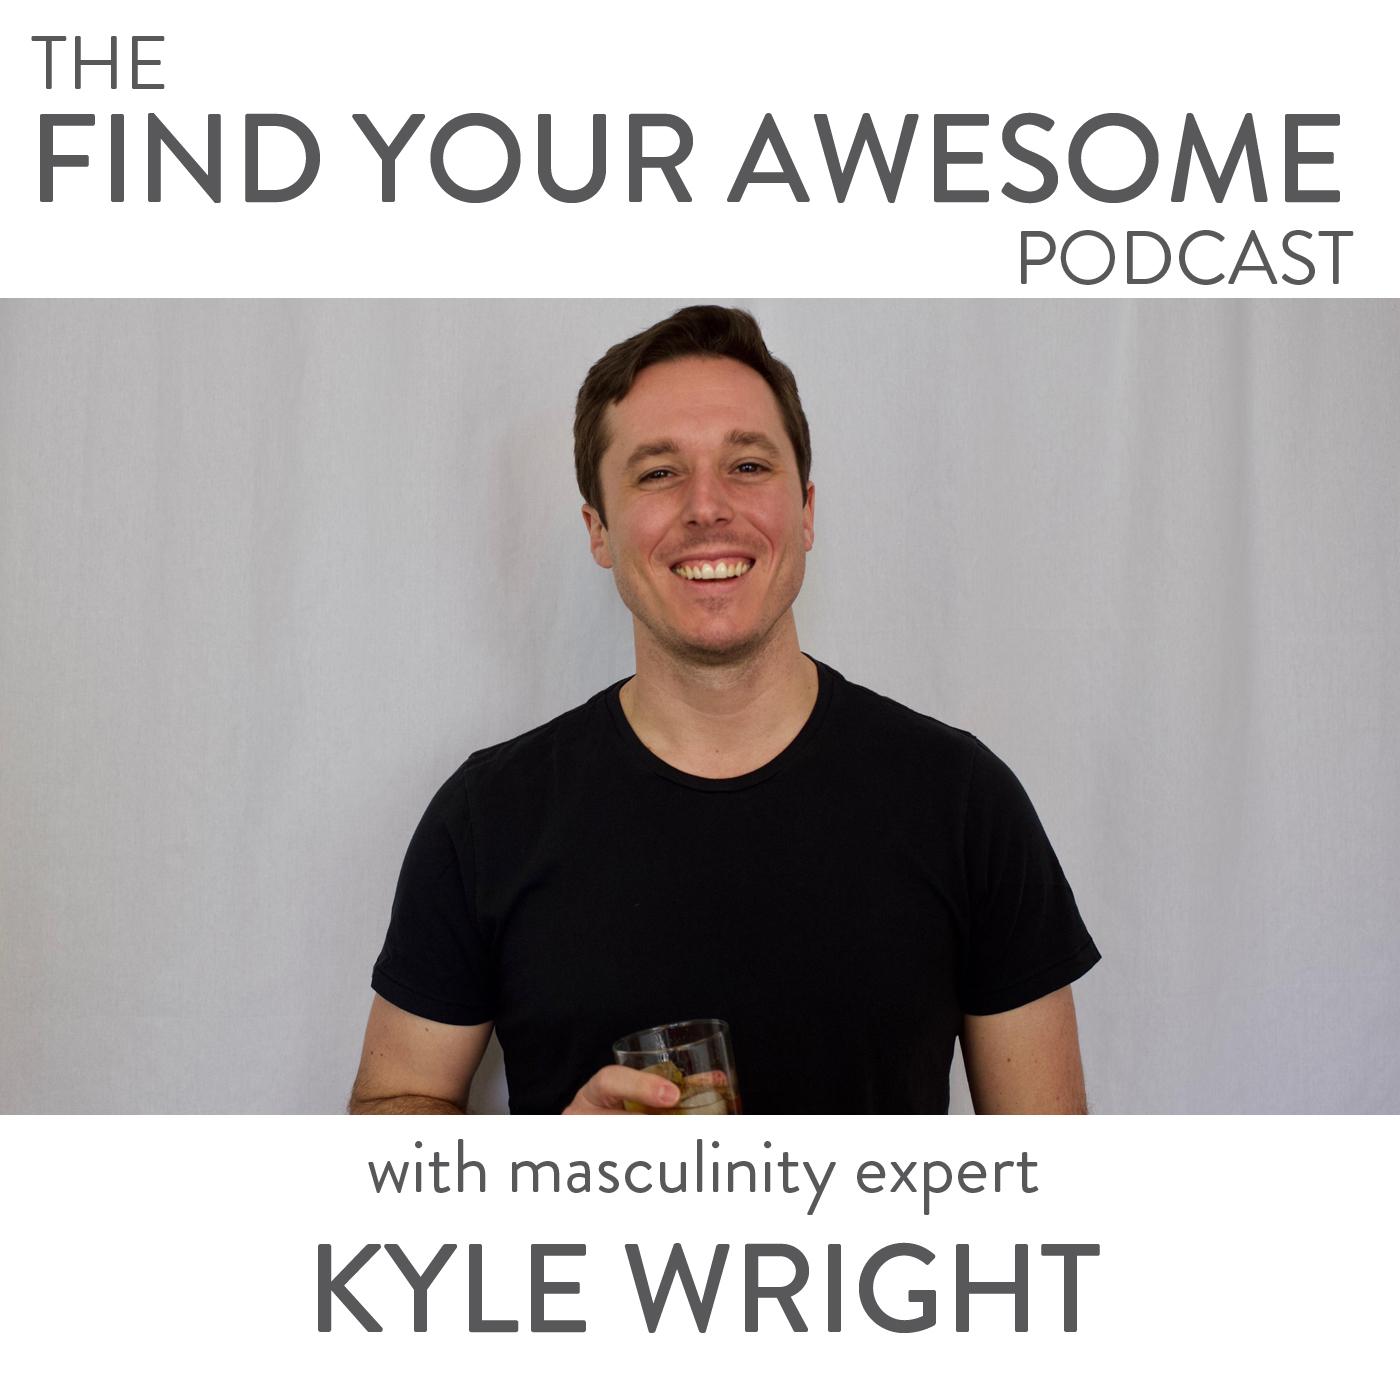 KyleWright_podcast_coverart.jpg